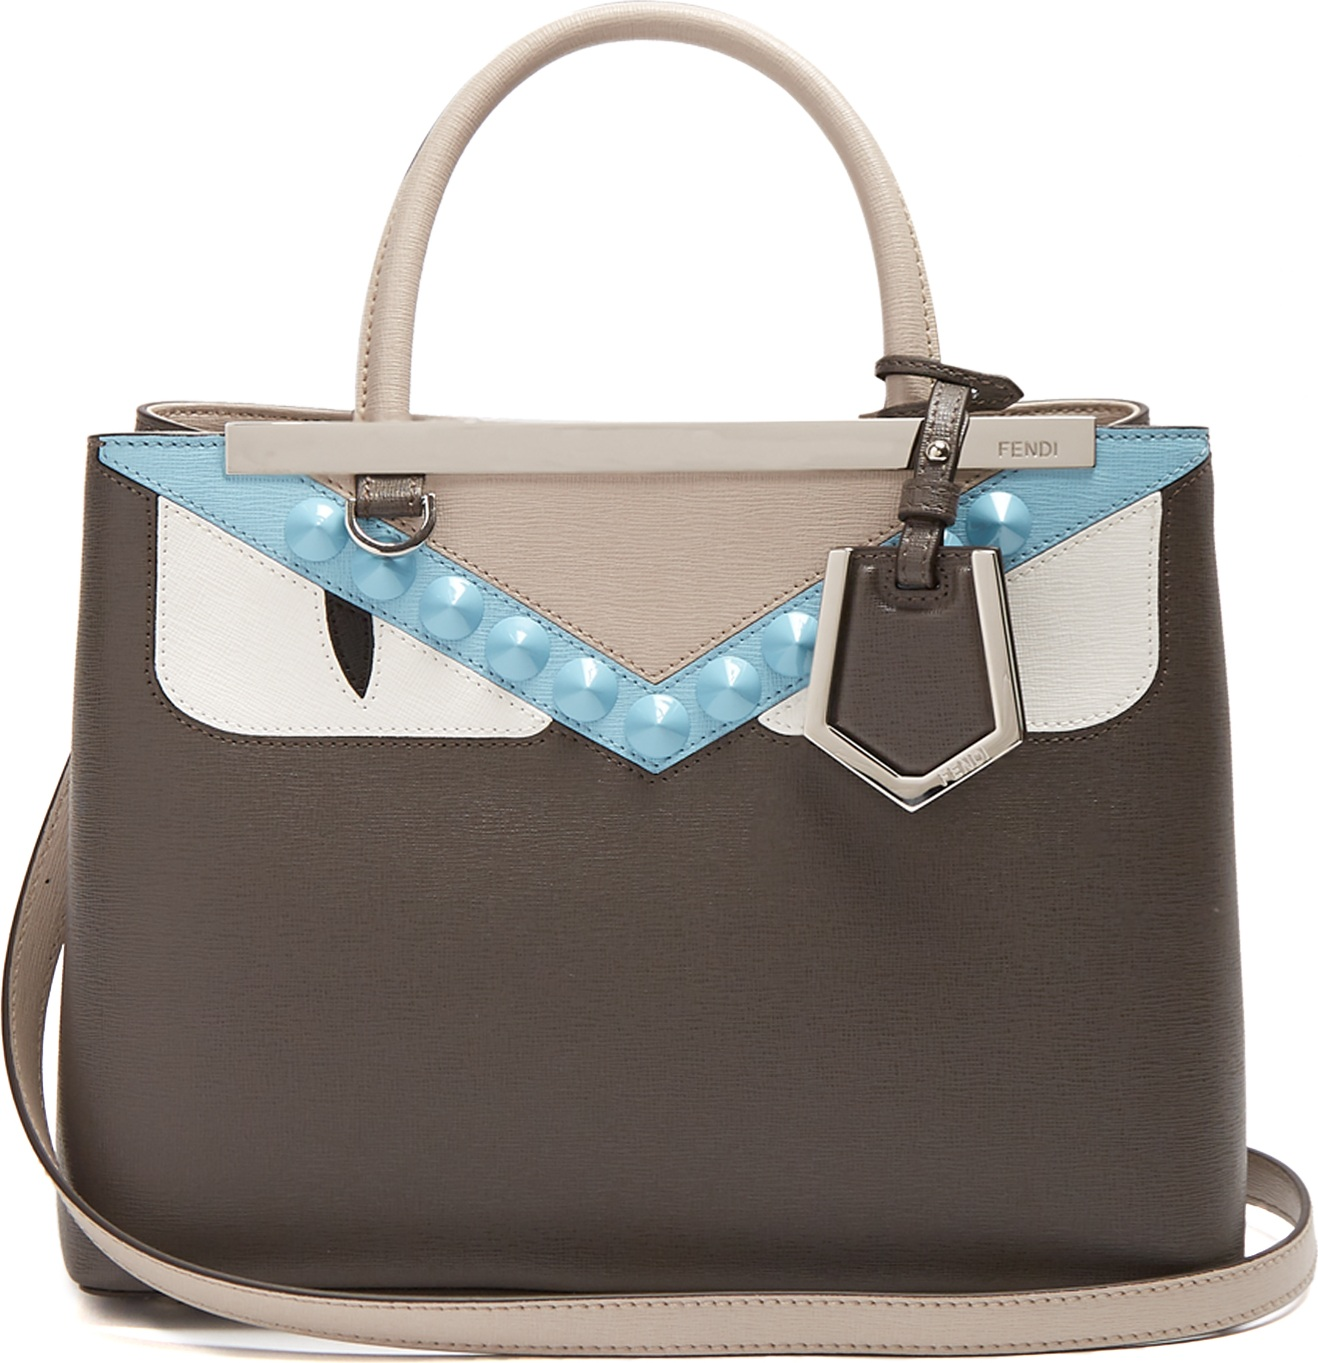 42bb01da2f Fendi Petite 2Jours Bag Bugs leather tote in Grey - mkt